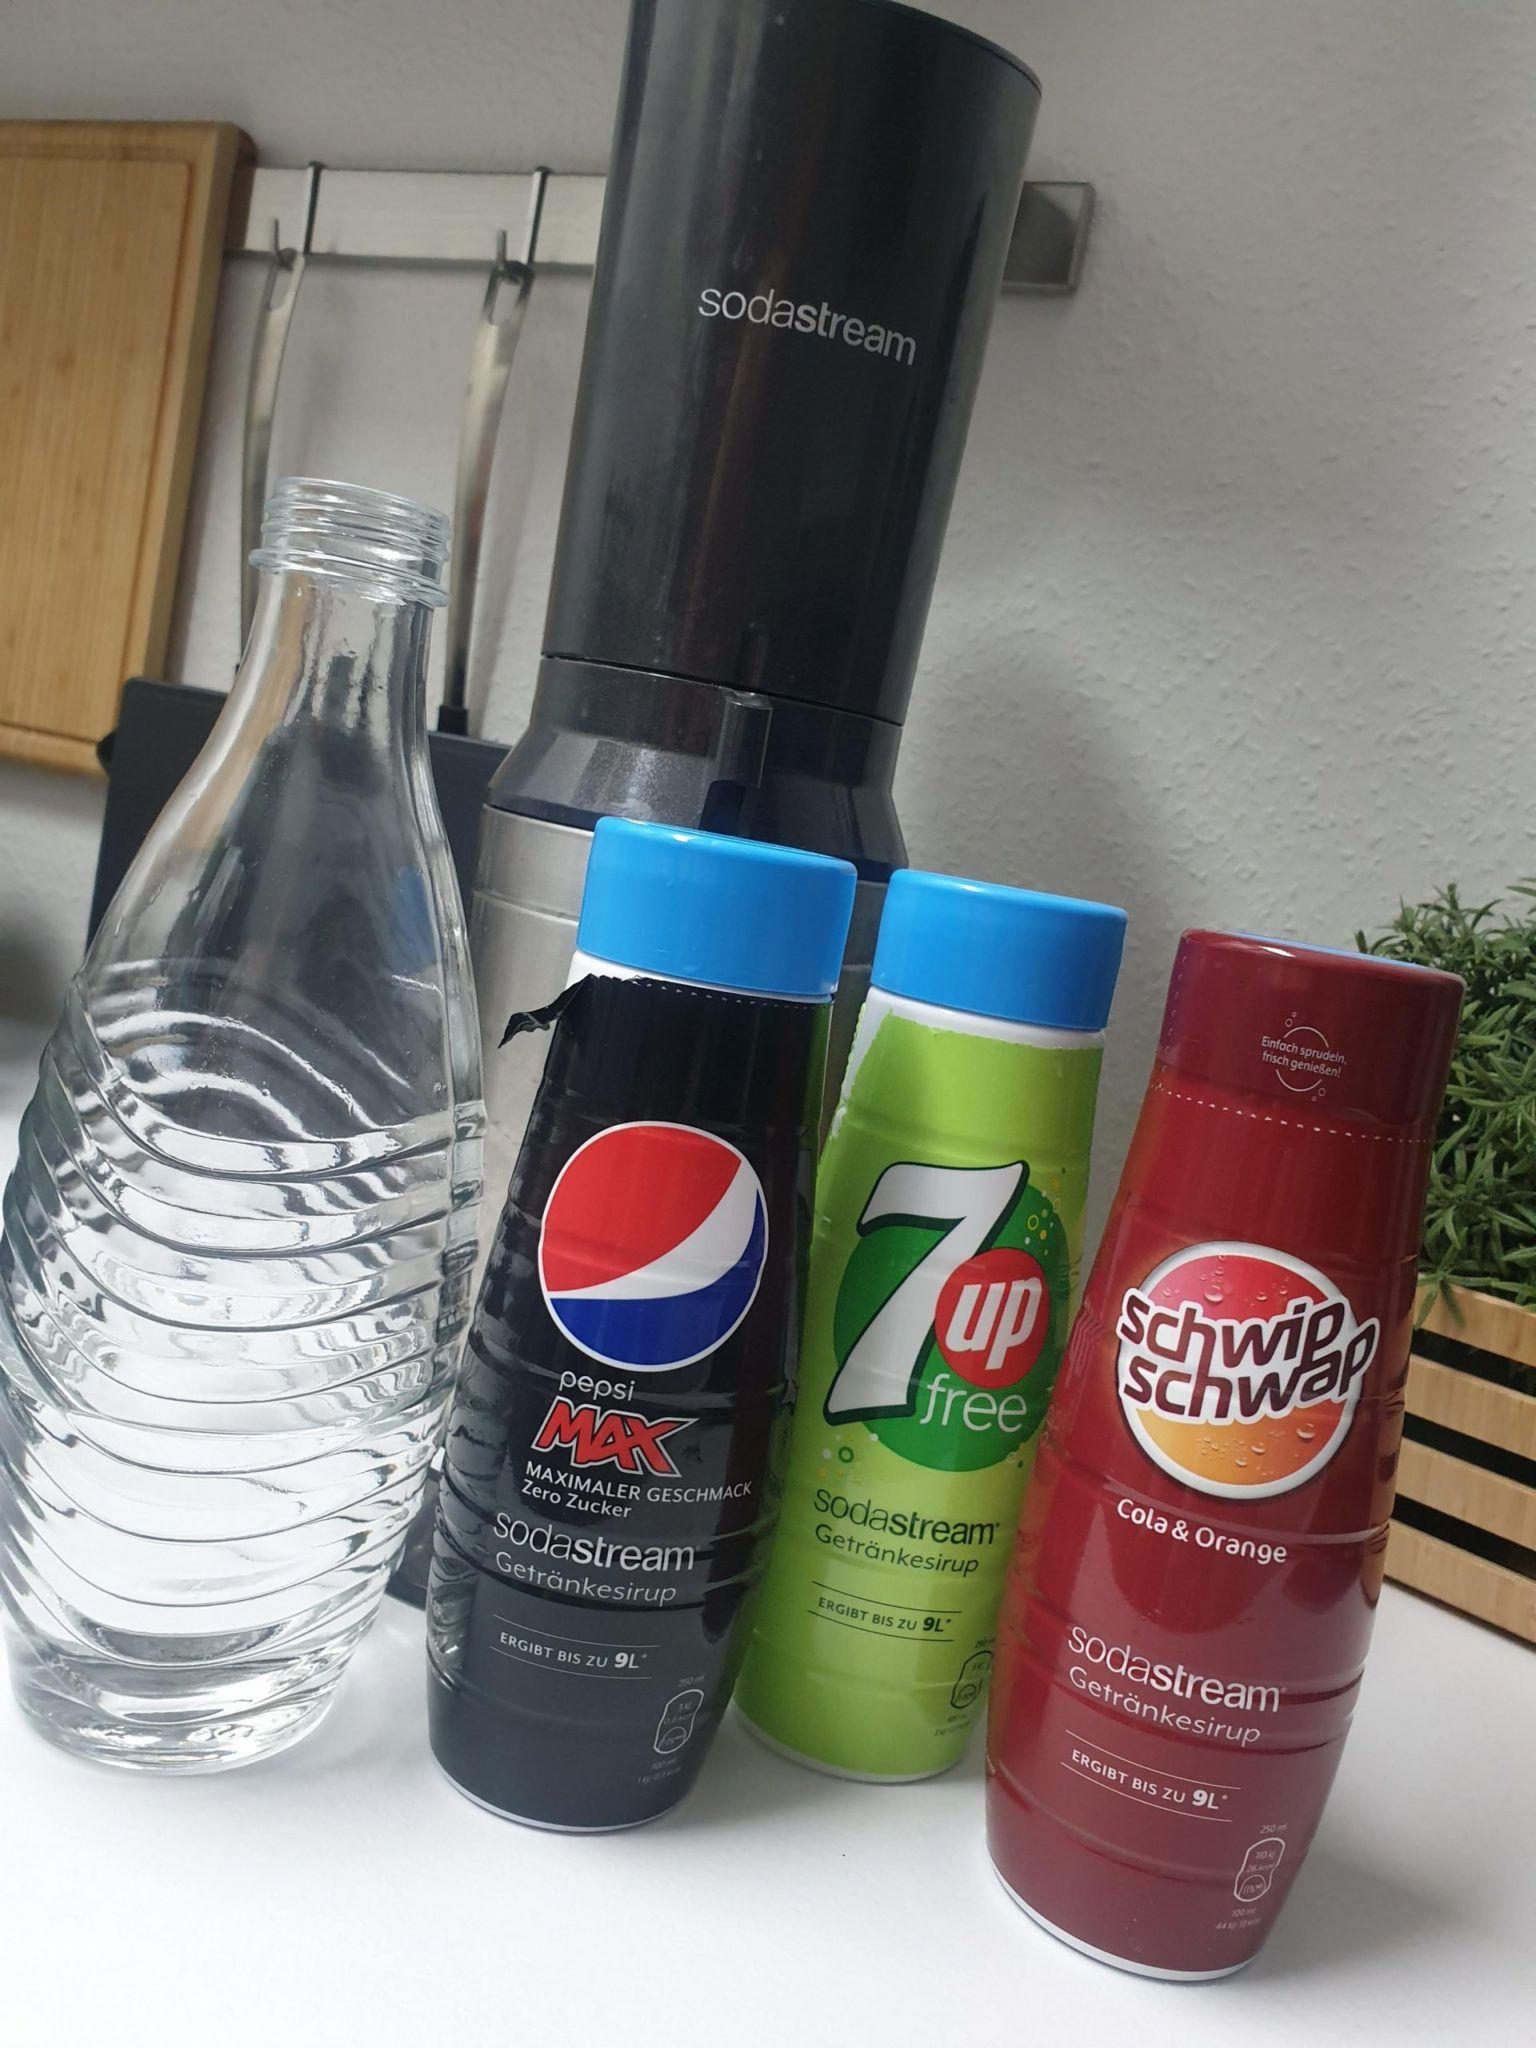 Soda Stream Sirup verschiedene Sorten Pepsi, 7up, Schwip Schwap 440ml